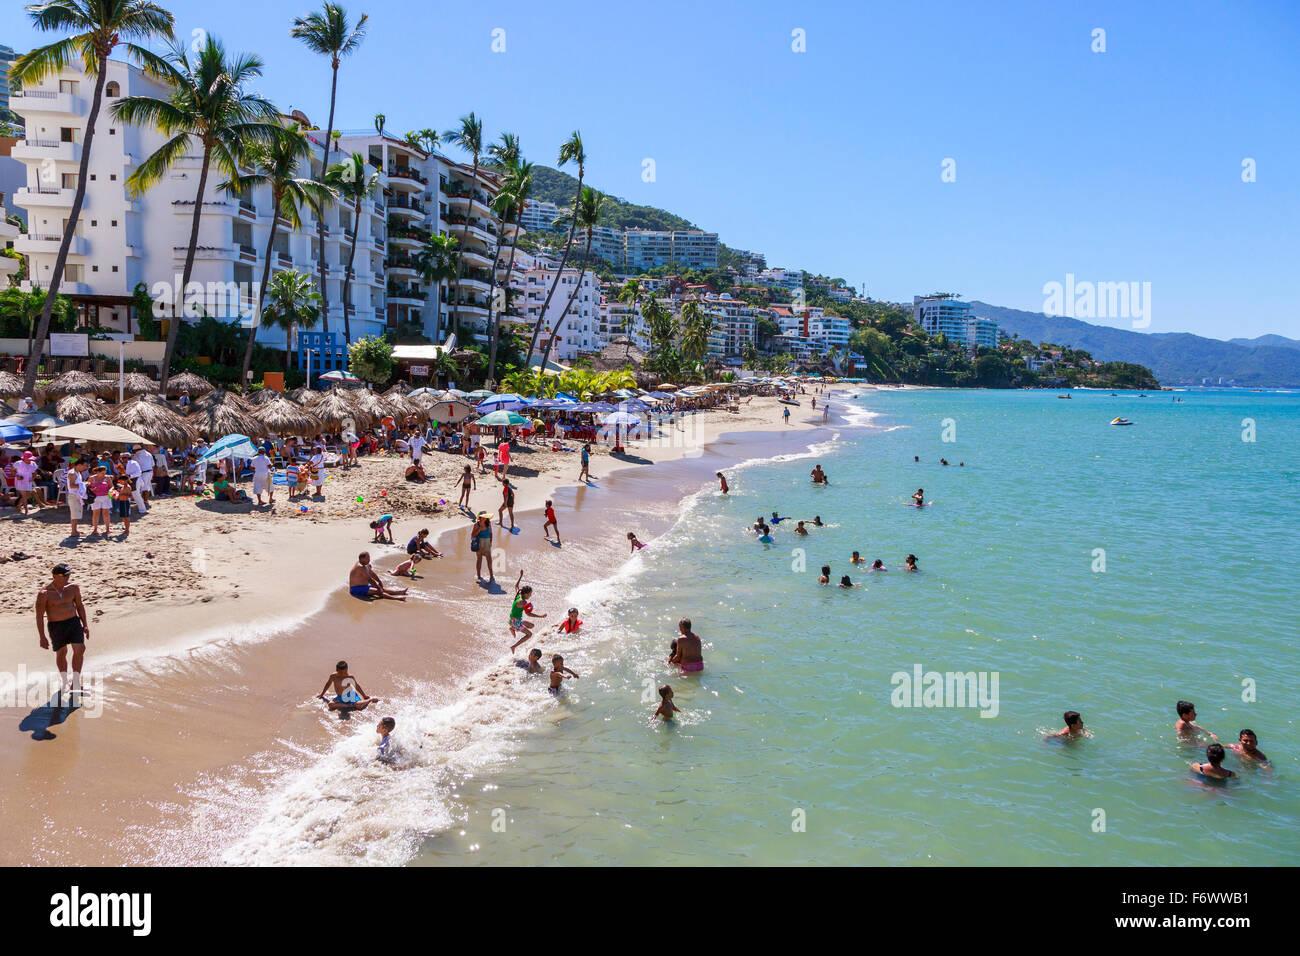 Beach at Zona Romantica, old town of Puerto Vallarta, Mexico - Stock Image